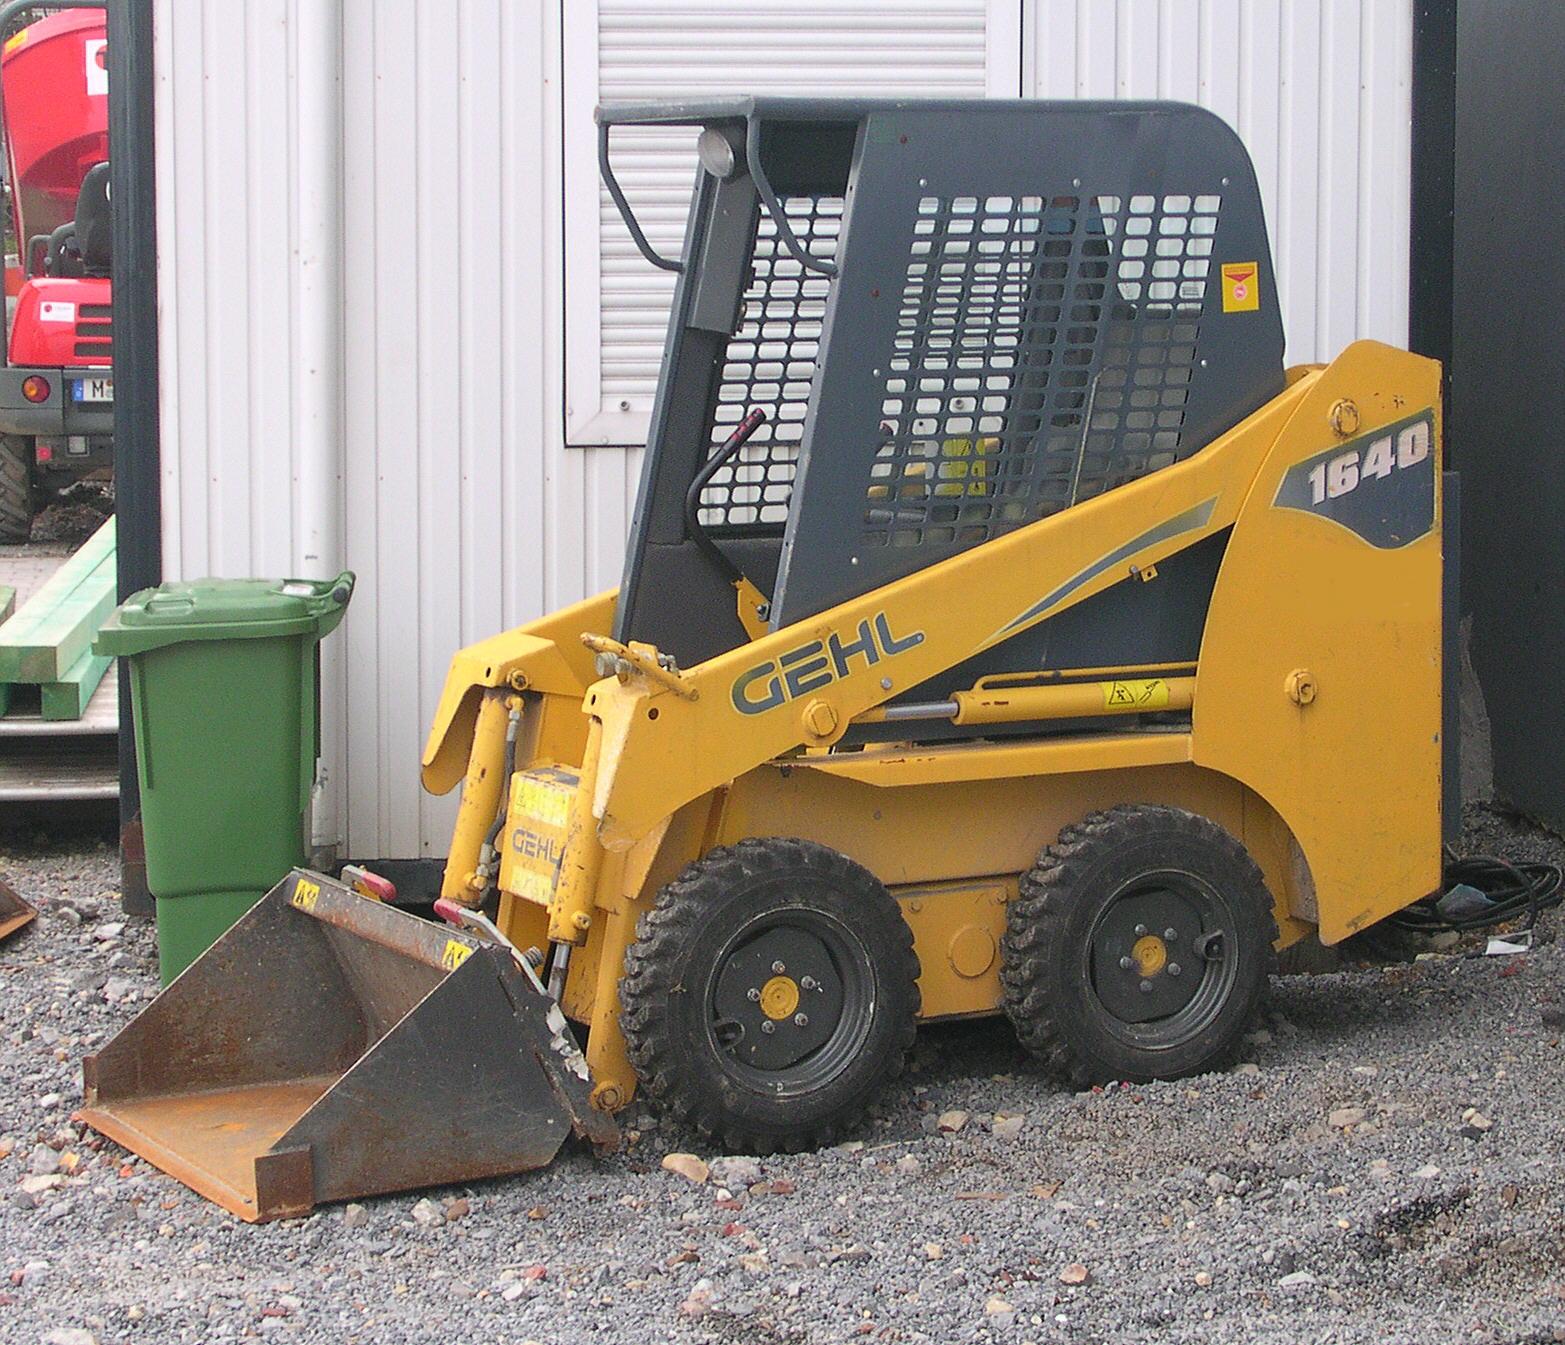 Gehl 1640 Tractor Amp Construction Plant Wiki Fandom